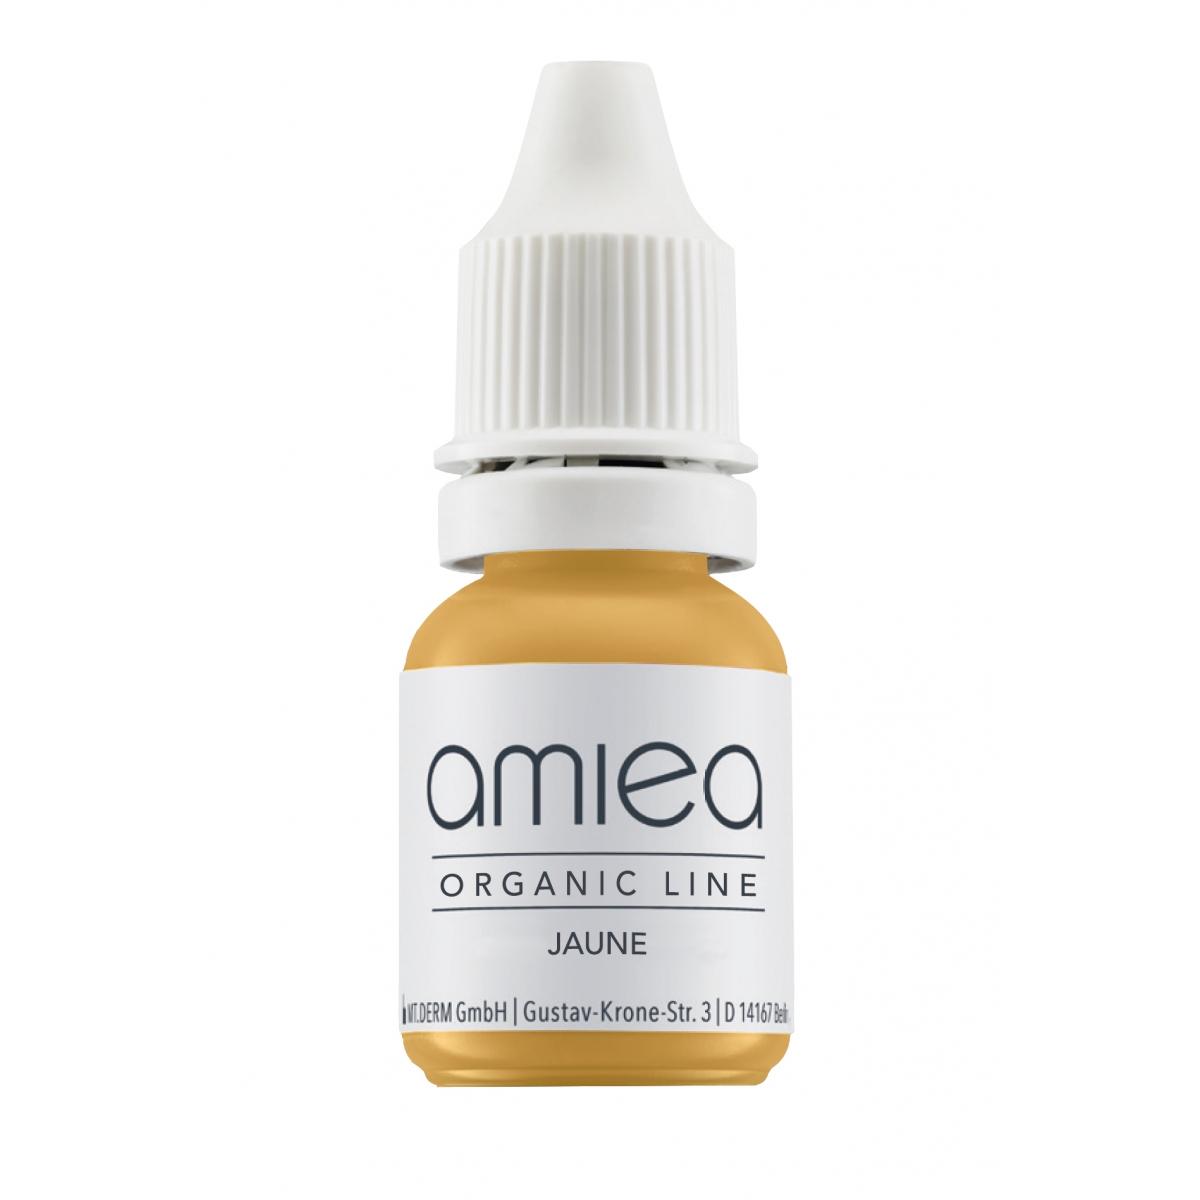 ORGANIC LINE (5ml)  - PIGMENT CORRECTEUR JAUNE ORGANICLINE AMIEA (5 ml)